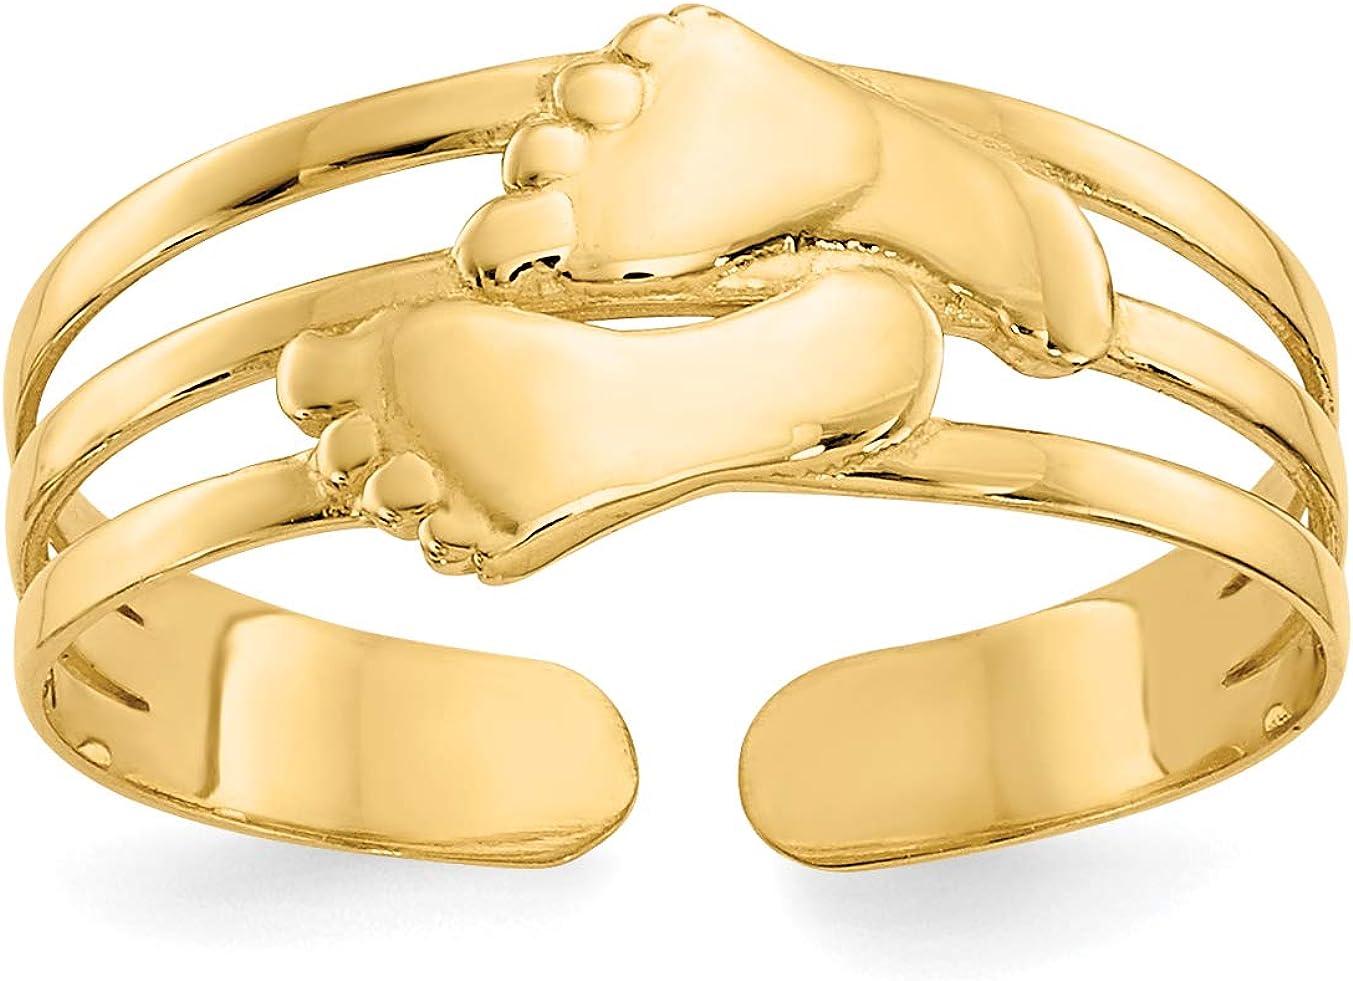 14K Yellow Gold Bare Feet Toe Ring